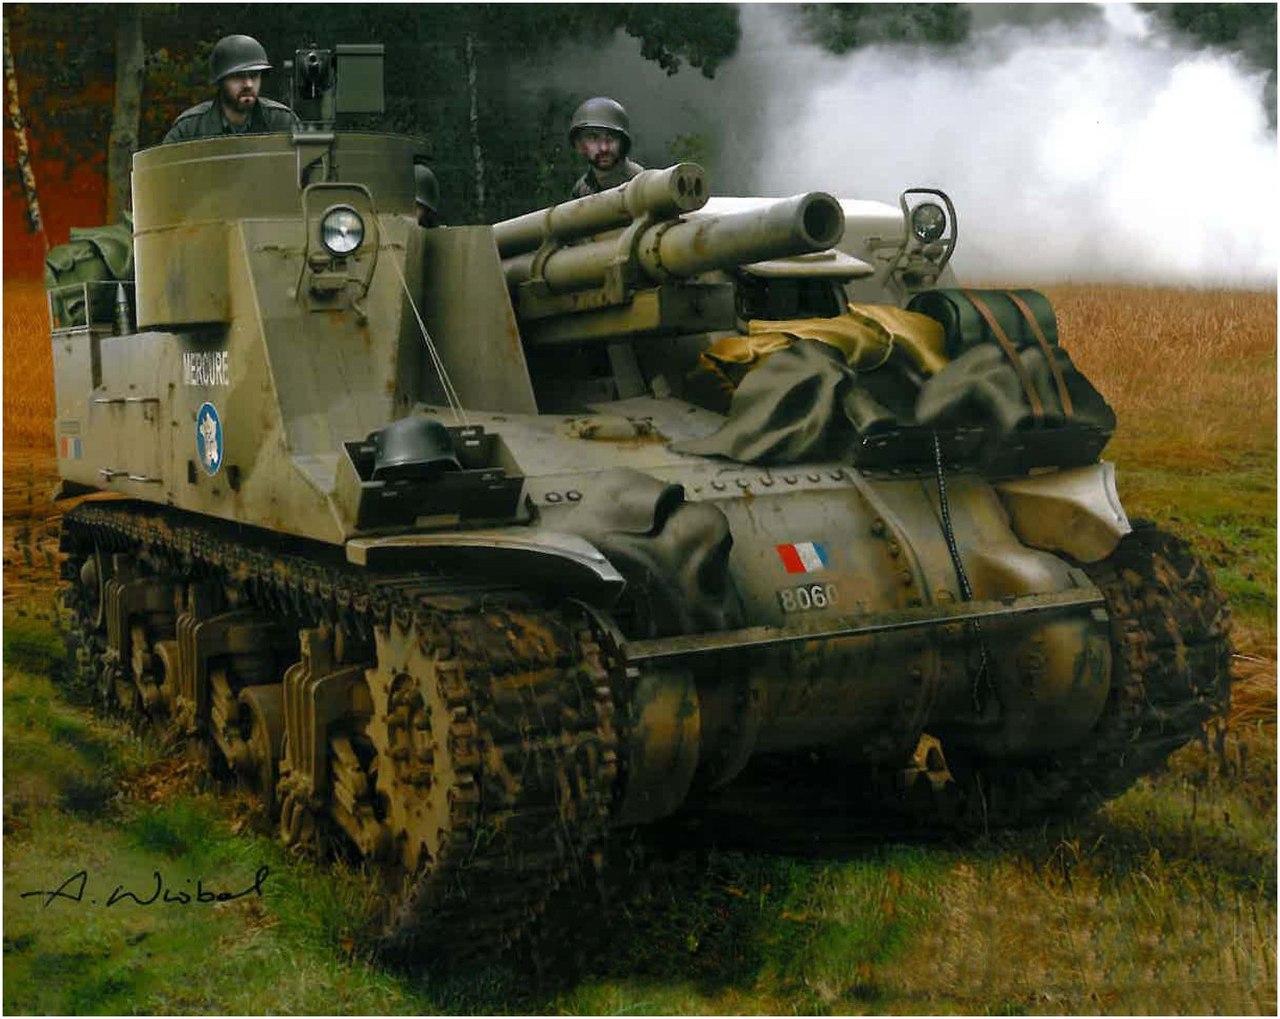 Wróbel Arkadiusz. Танк M-7 Priest.